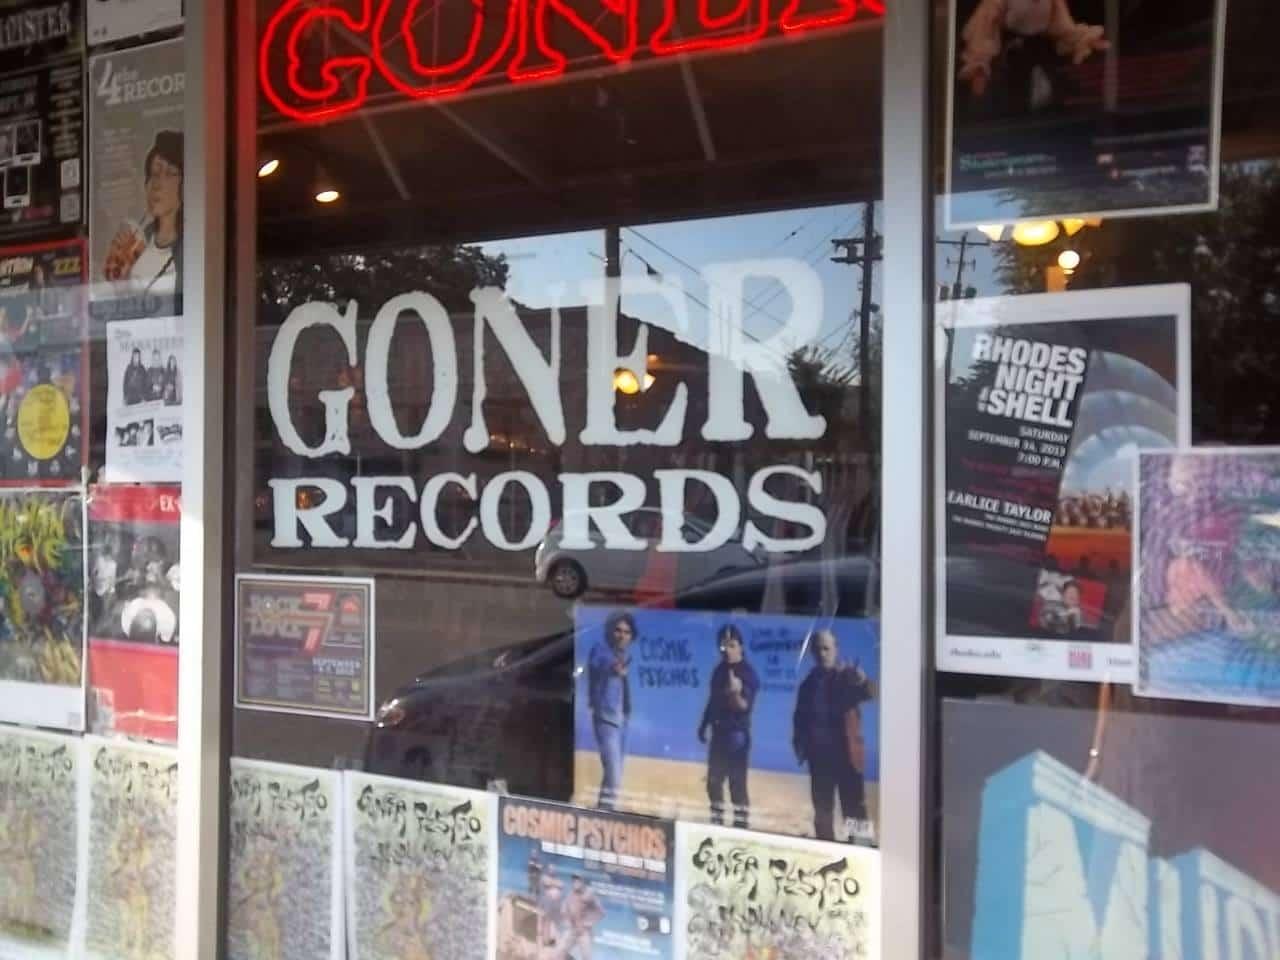 GonerFest 15 hosted by Goner Records